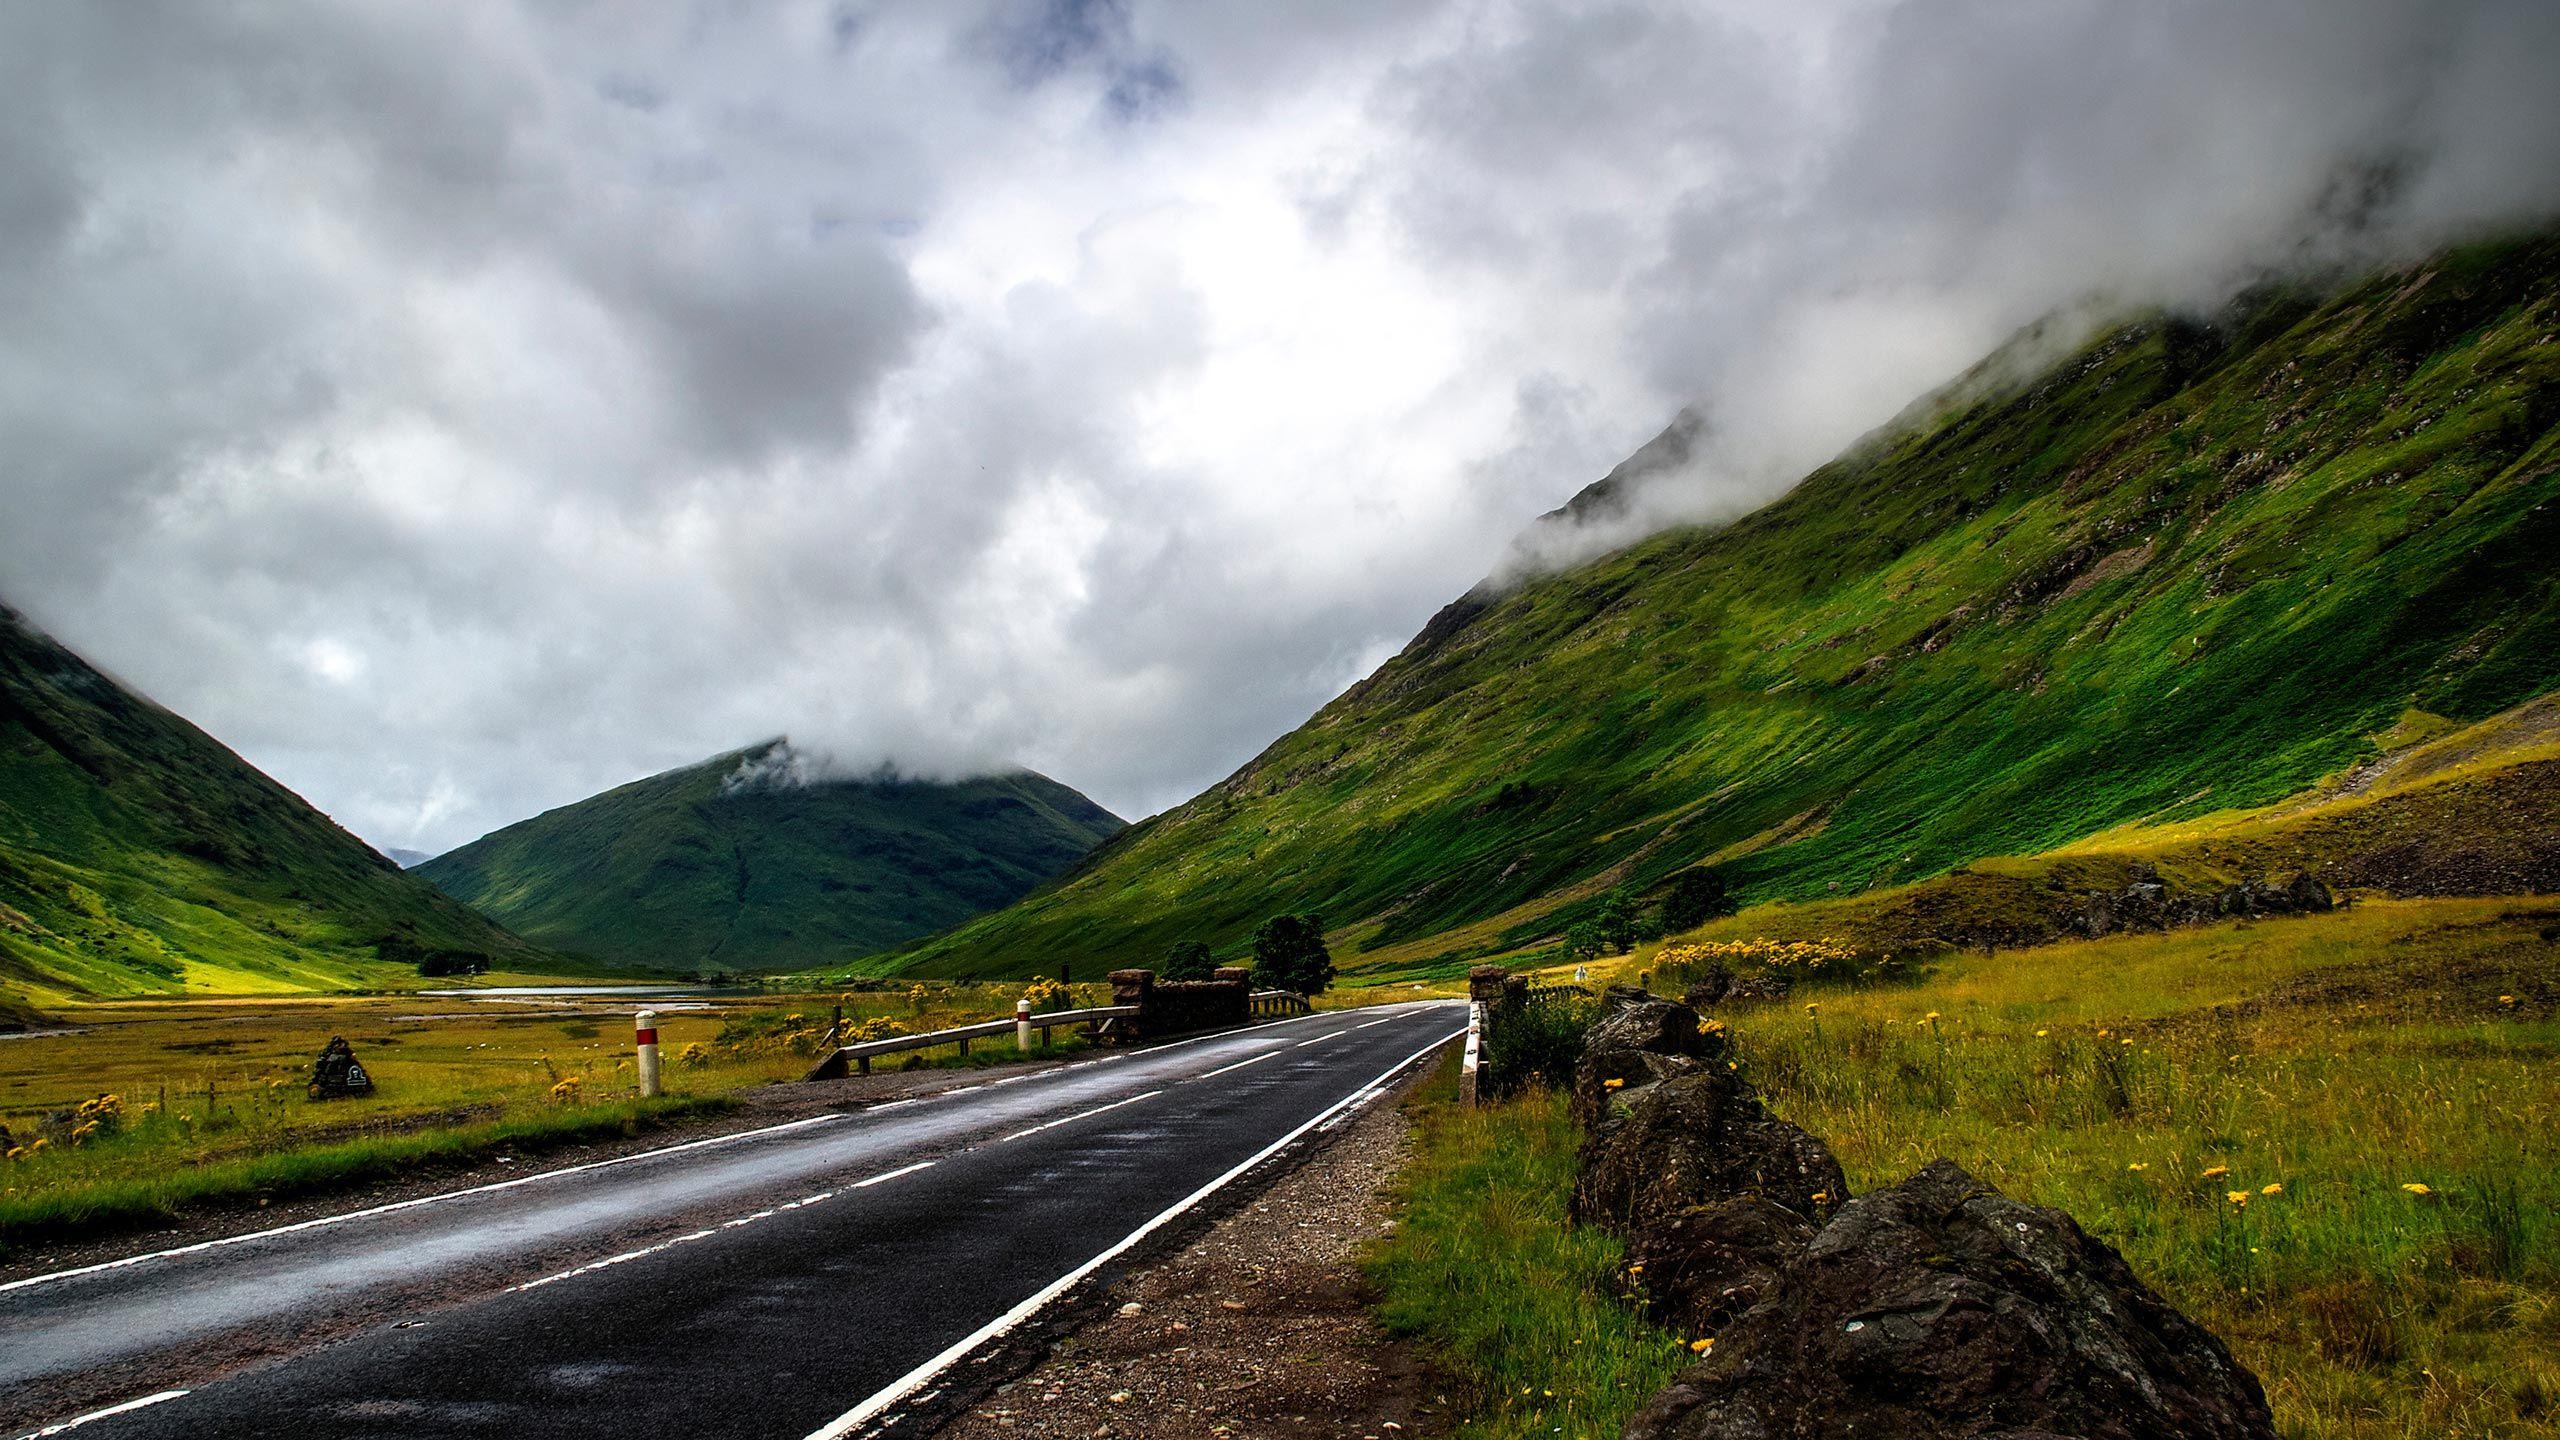 Road_2560x1440.jpg